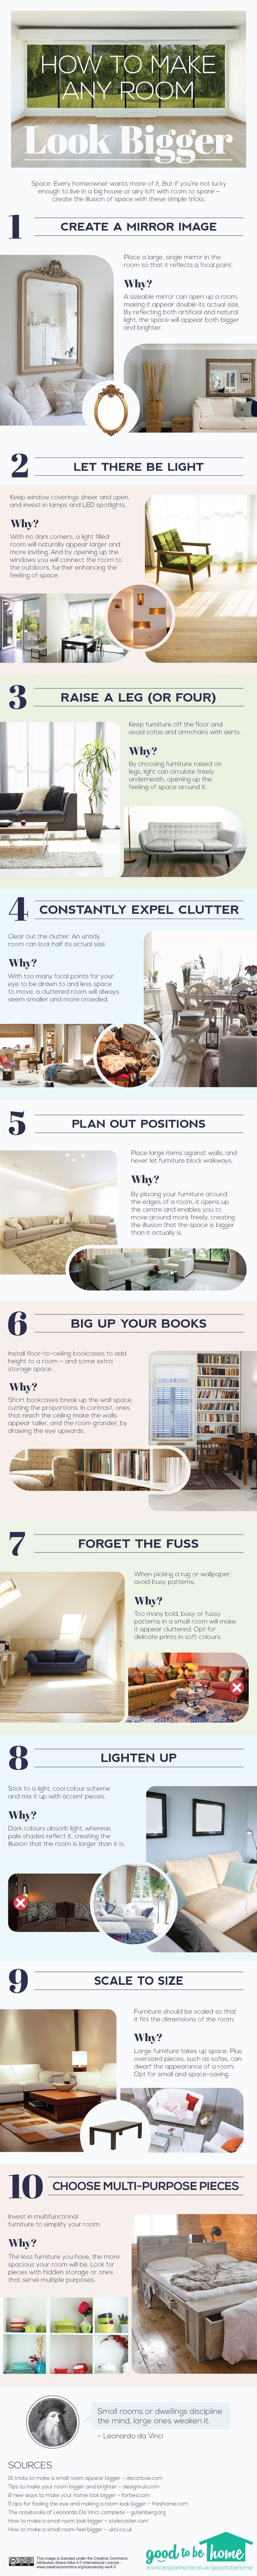 best 25 small basement decor ideas only on pinterest small